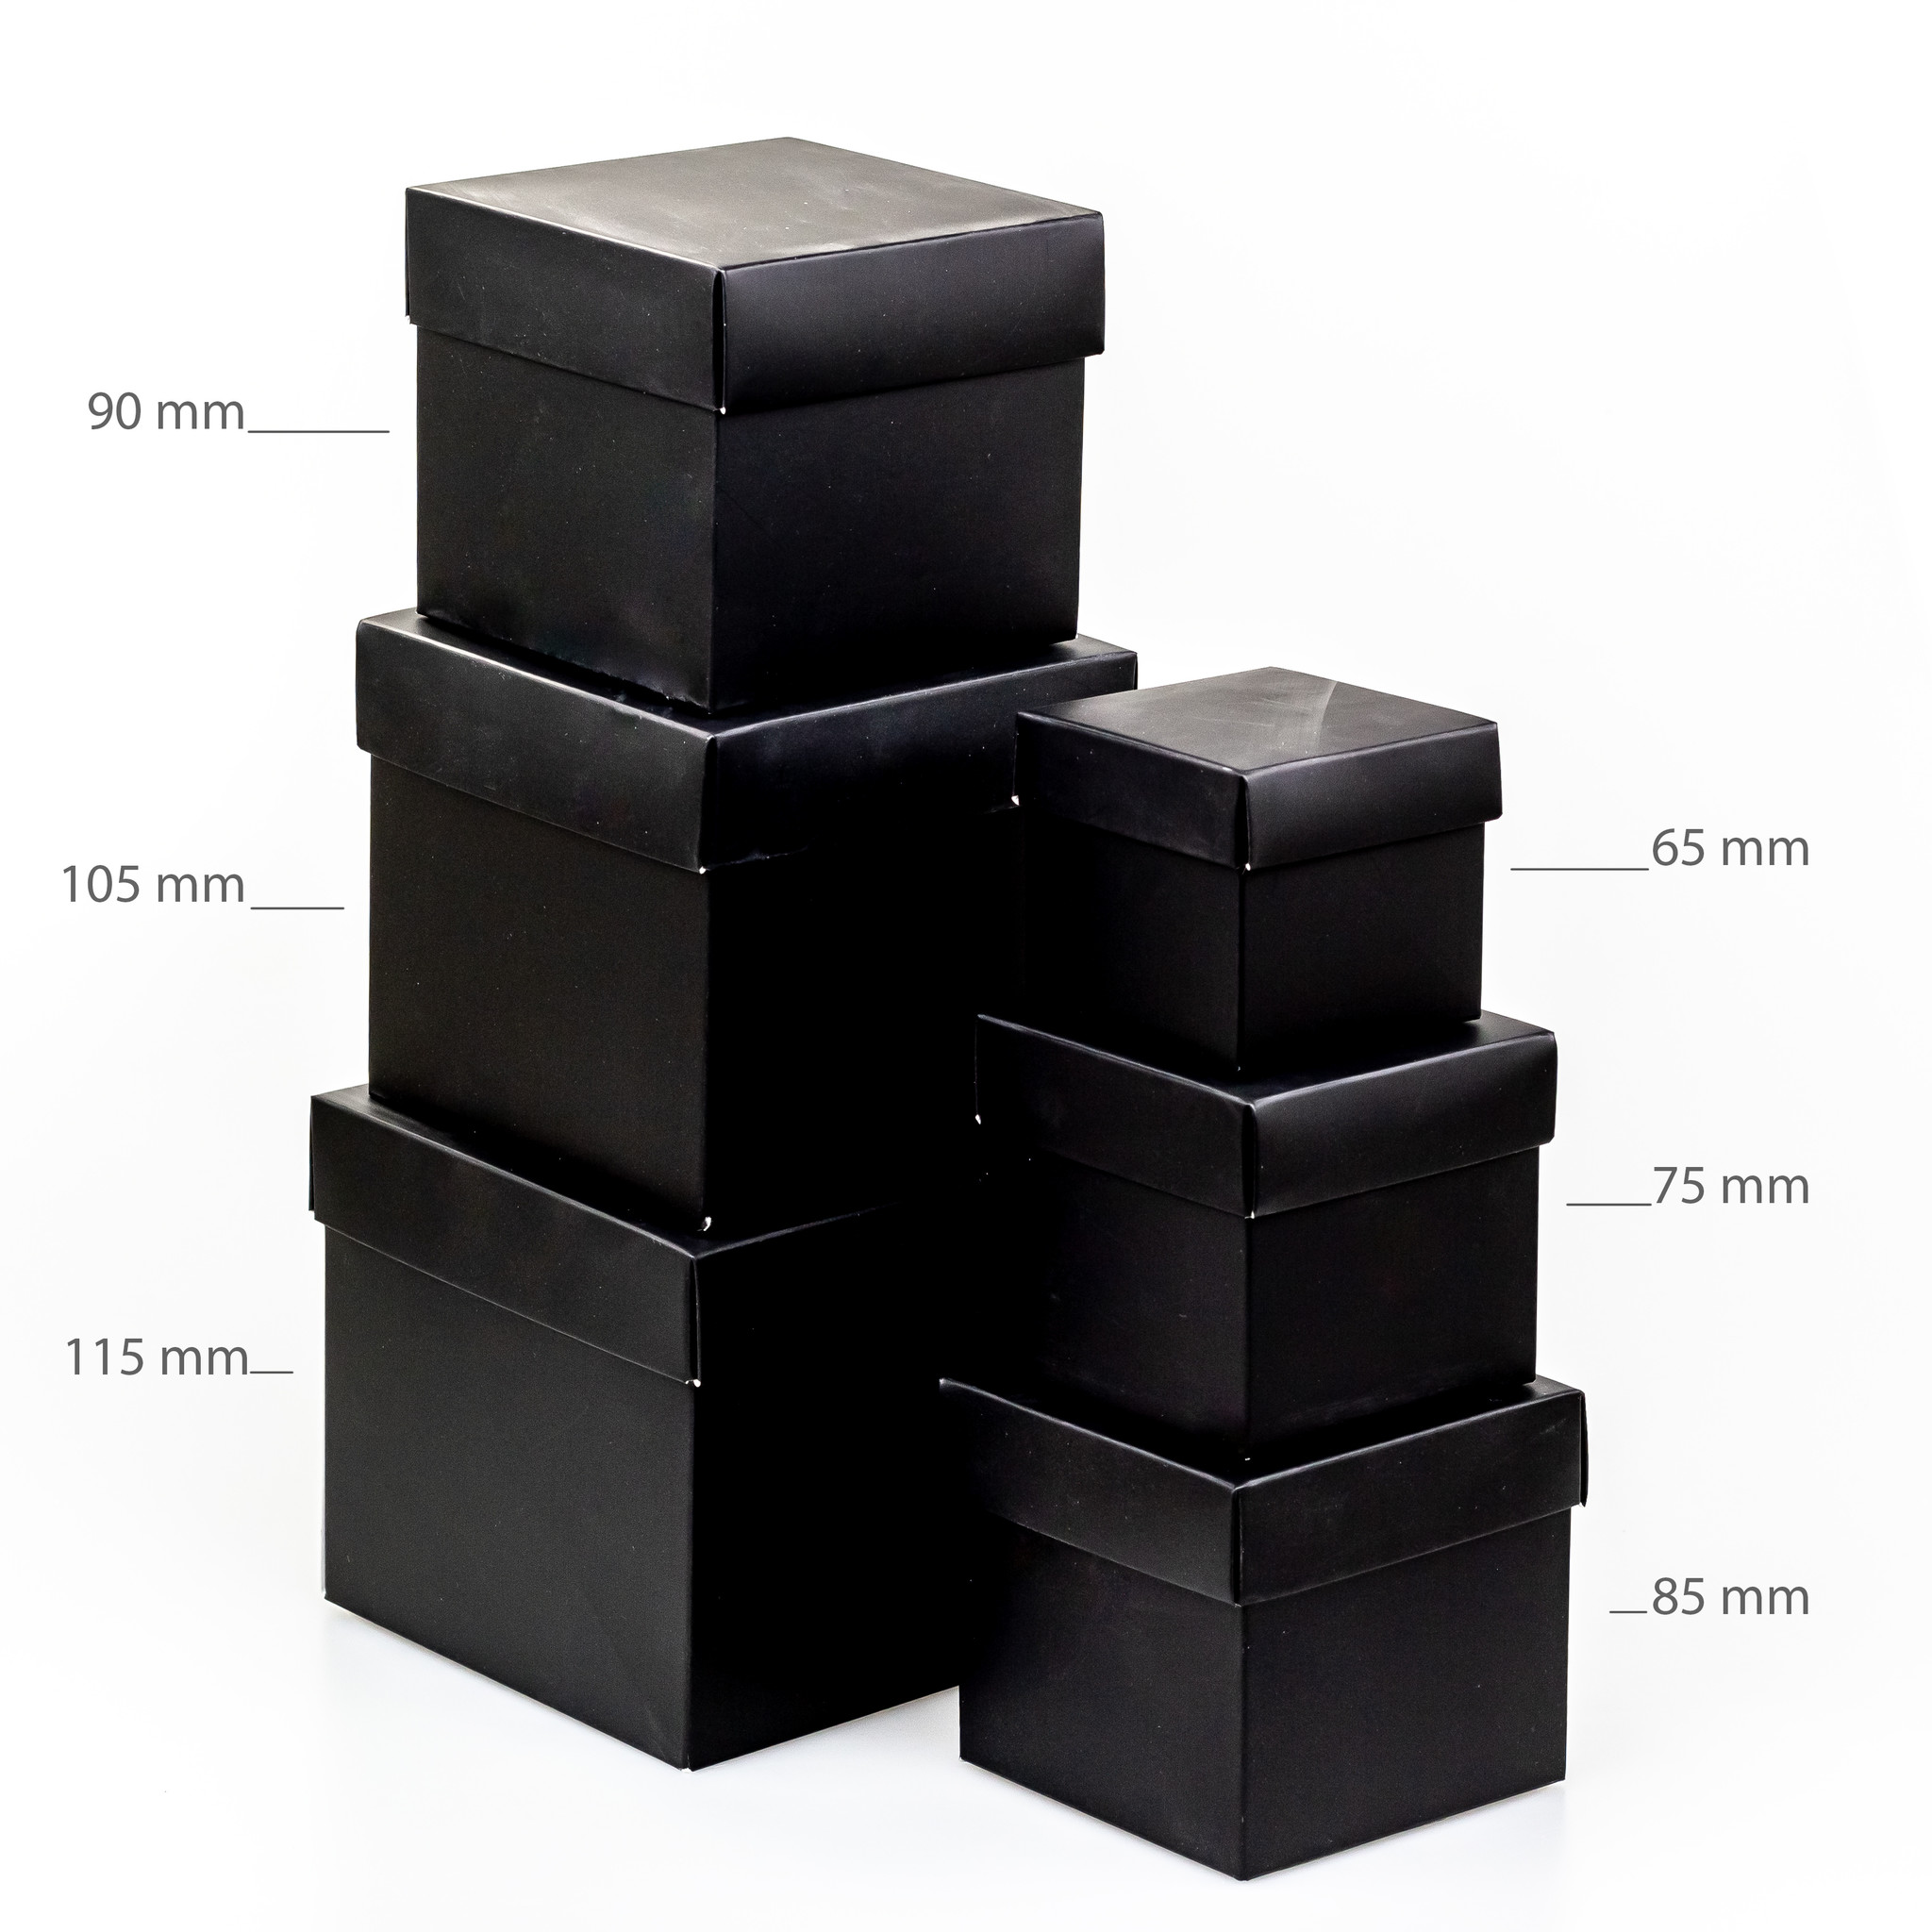 Cubebox - Shiny Brown